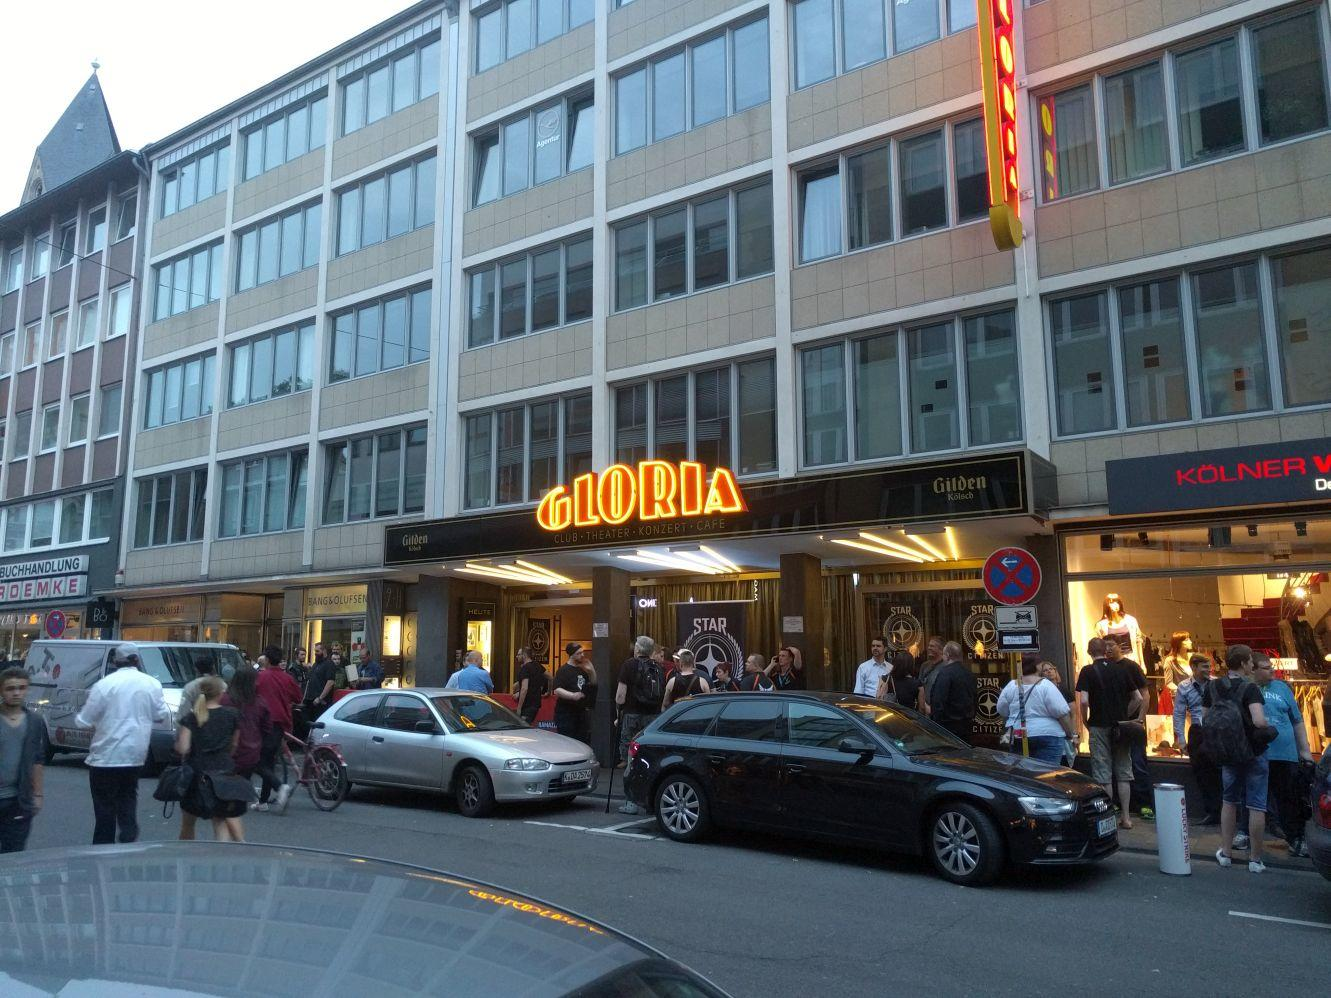 Gamescom 2016 - Kolejka na event SC przed Gloria Theater